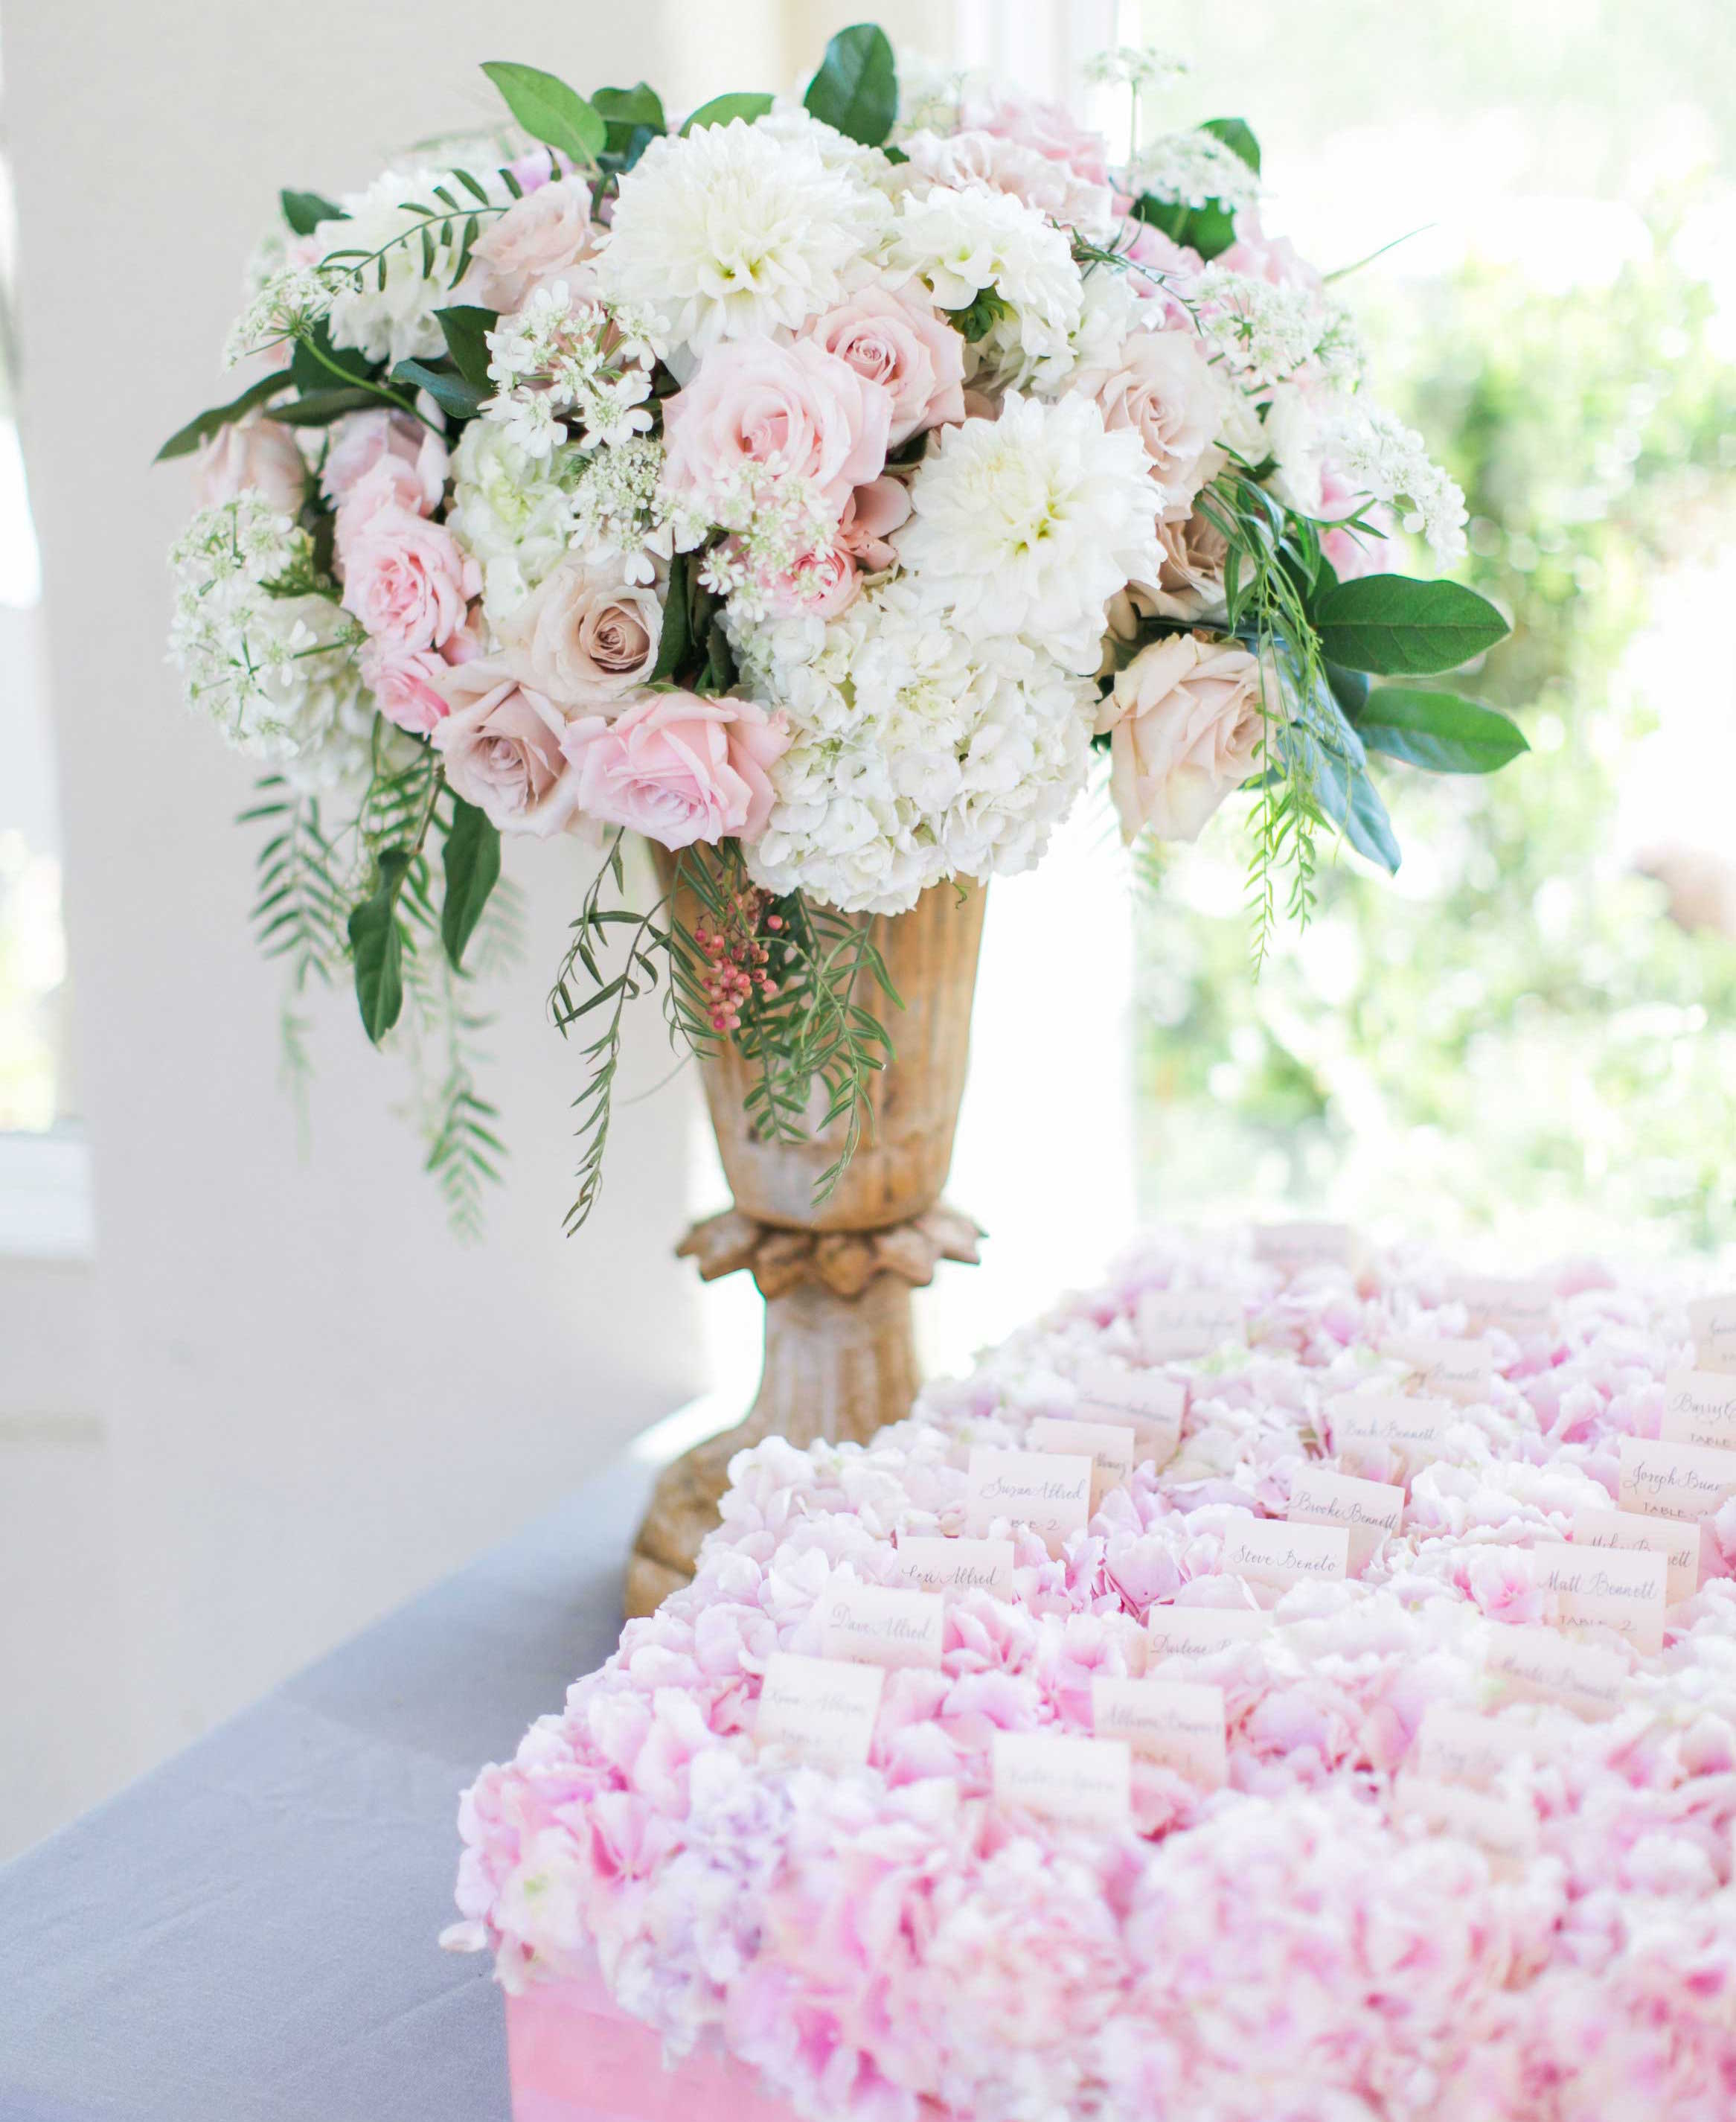 Wedding escort cards on top of light pastel pink flowers